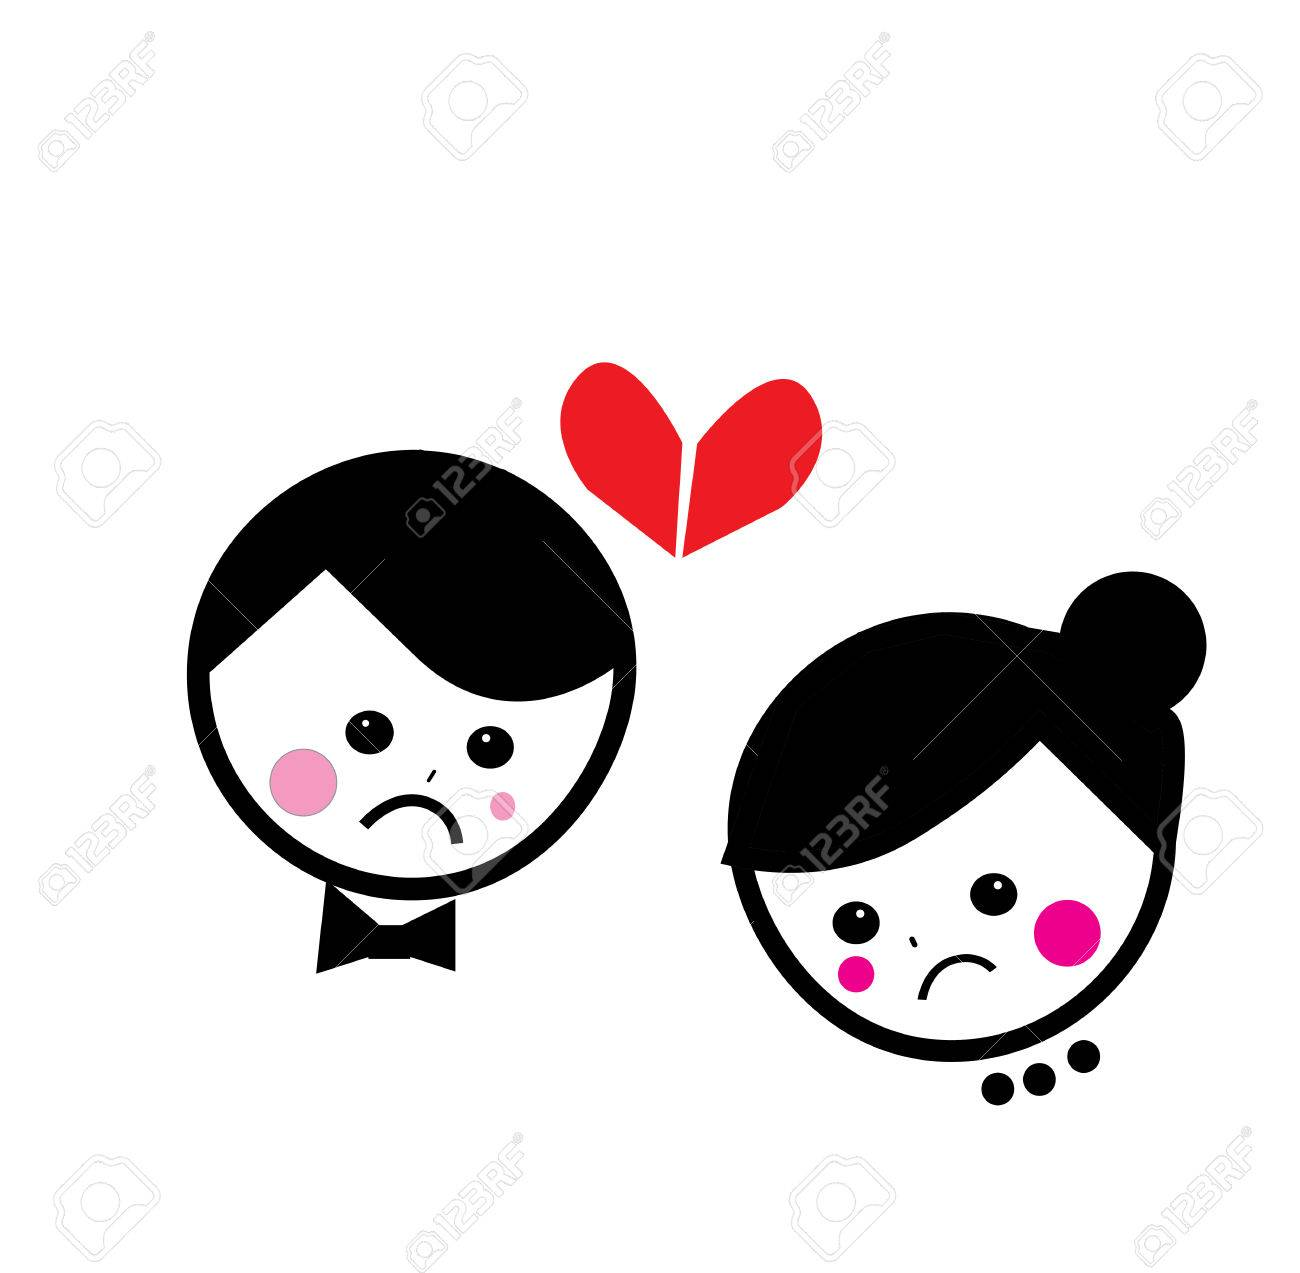 Heart Broken Couples Cartoon Vector Background Royalty Free